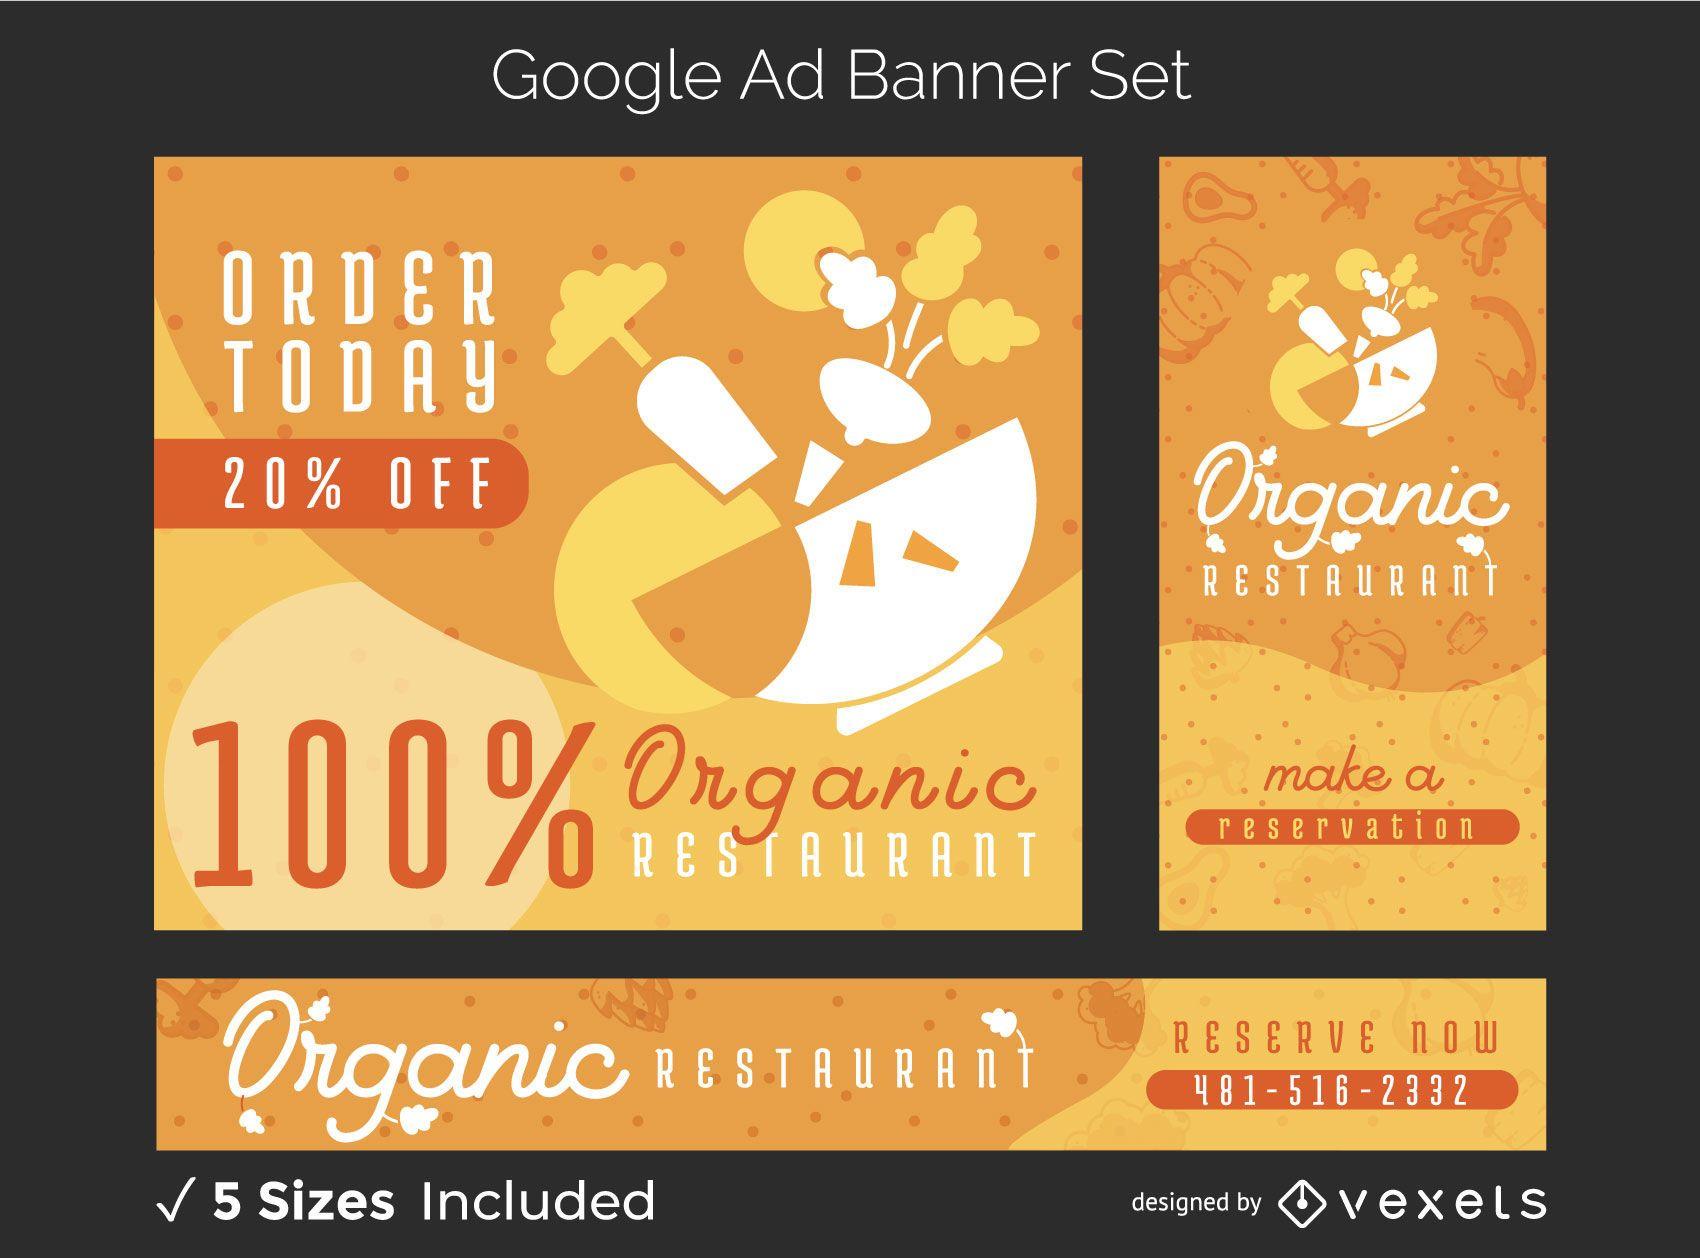 Organic food restaurant banner set